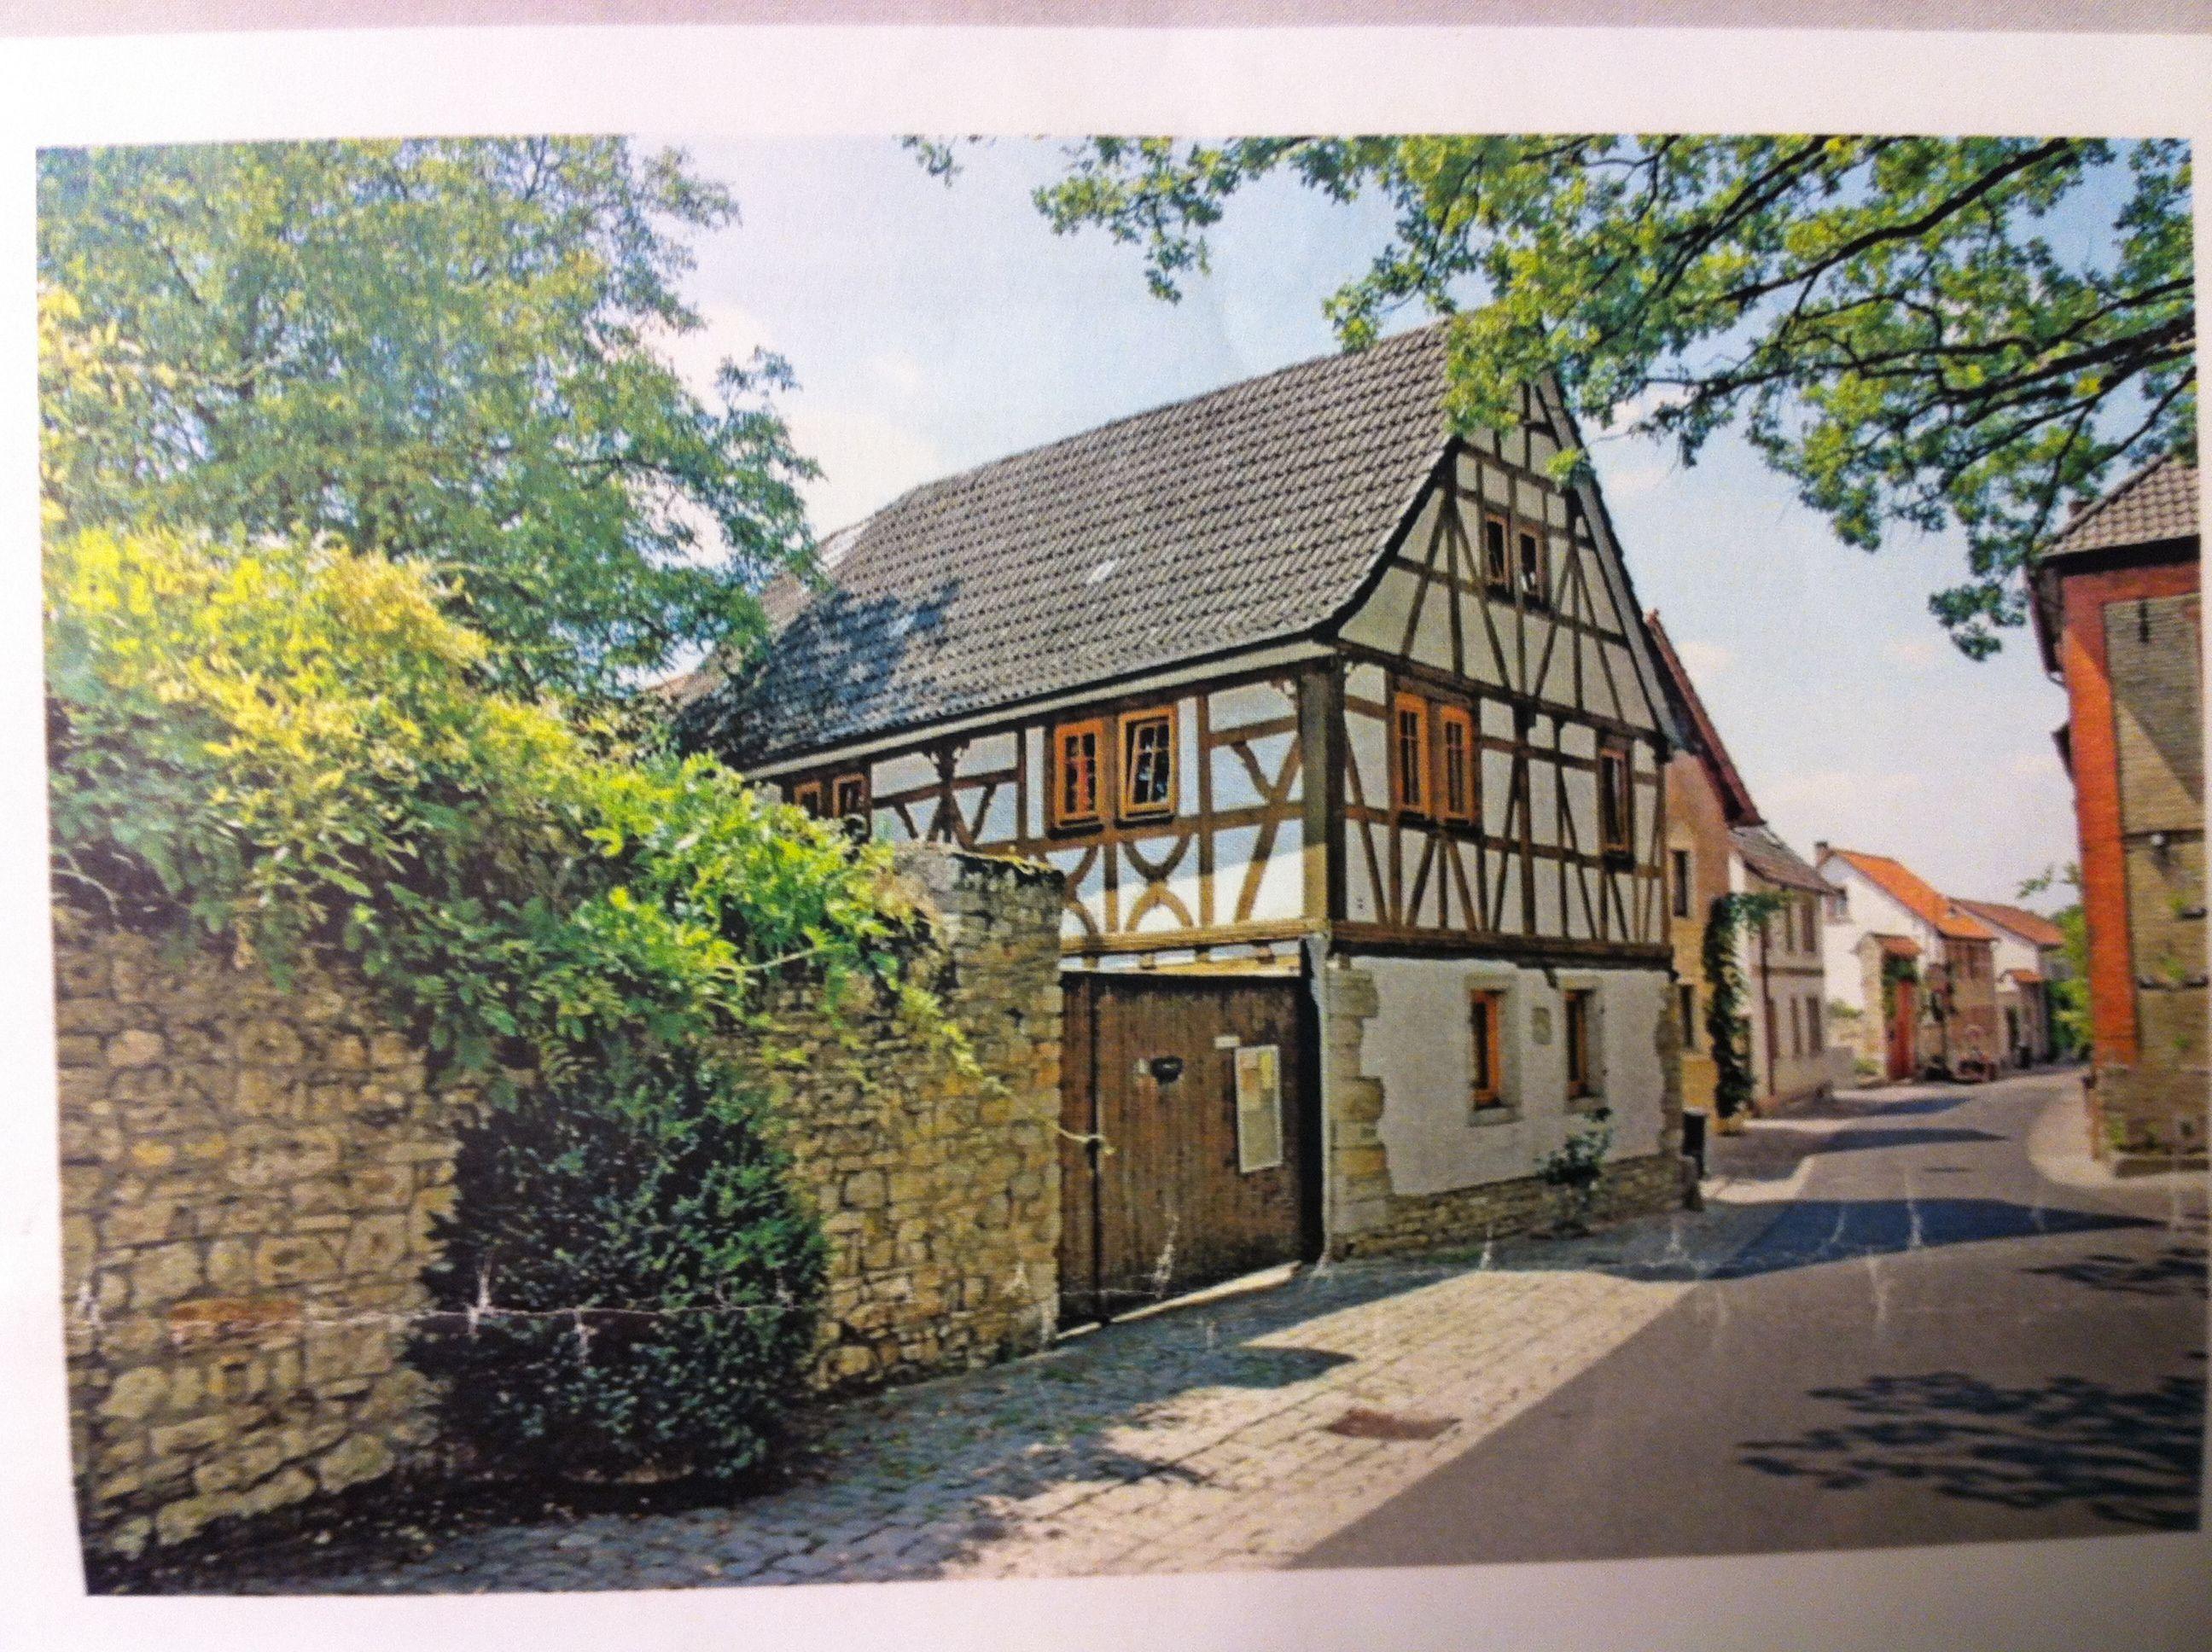 Art of color worrstadt - Art Of Color Worrstadt File Hakenhof W Rrstadt Rommersheim Jpg